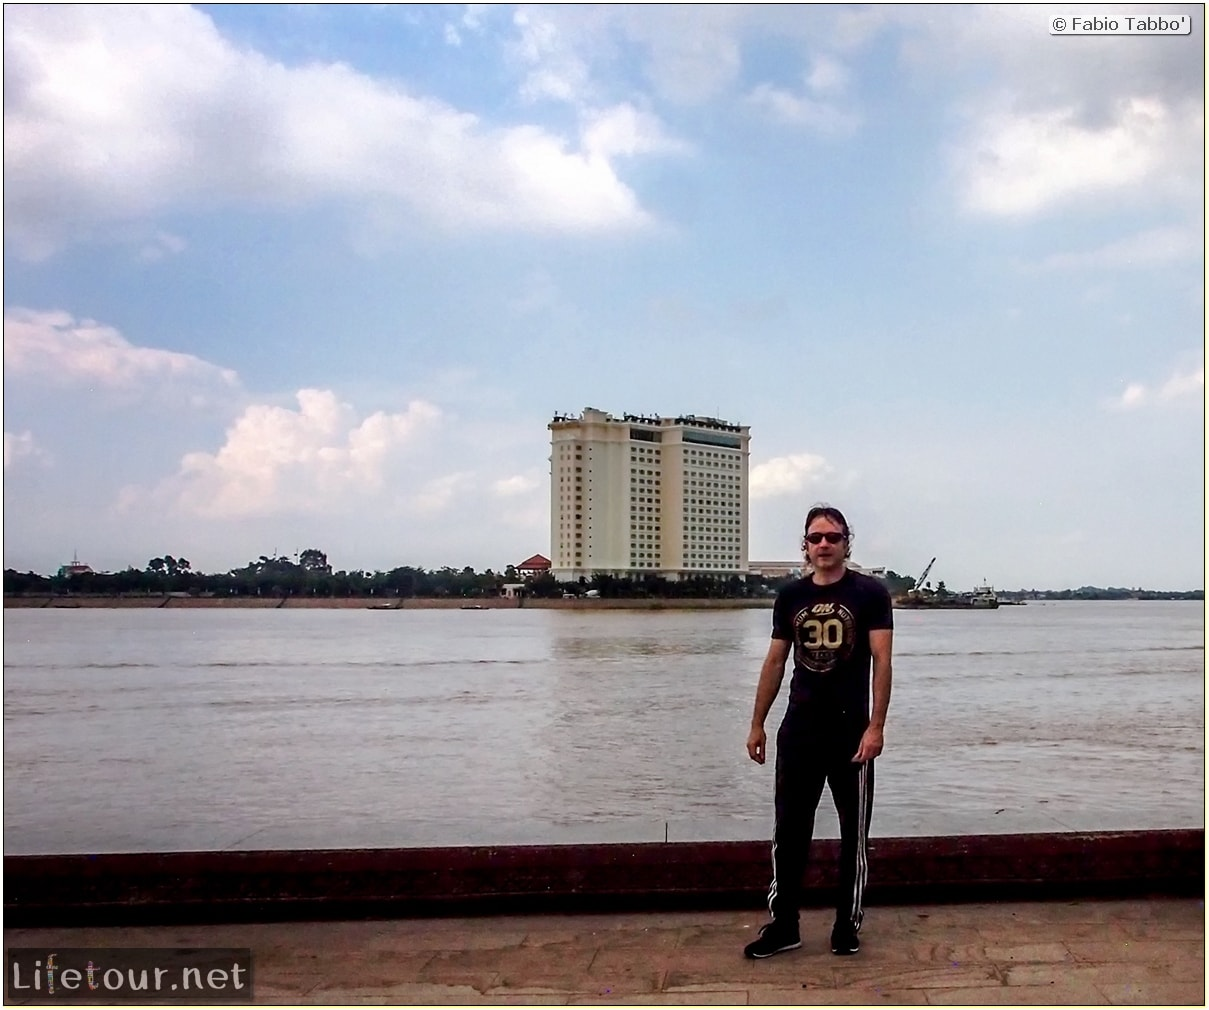 Fabio_s-LifeTour---Cambodia-(2017-July-August)---Phnom-Penh---Sisowath-Quay---20095